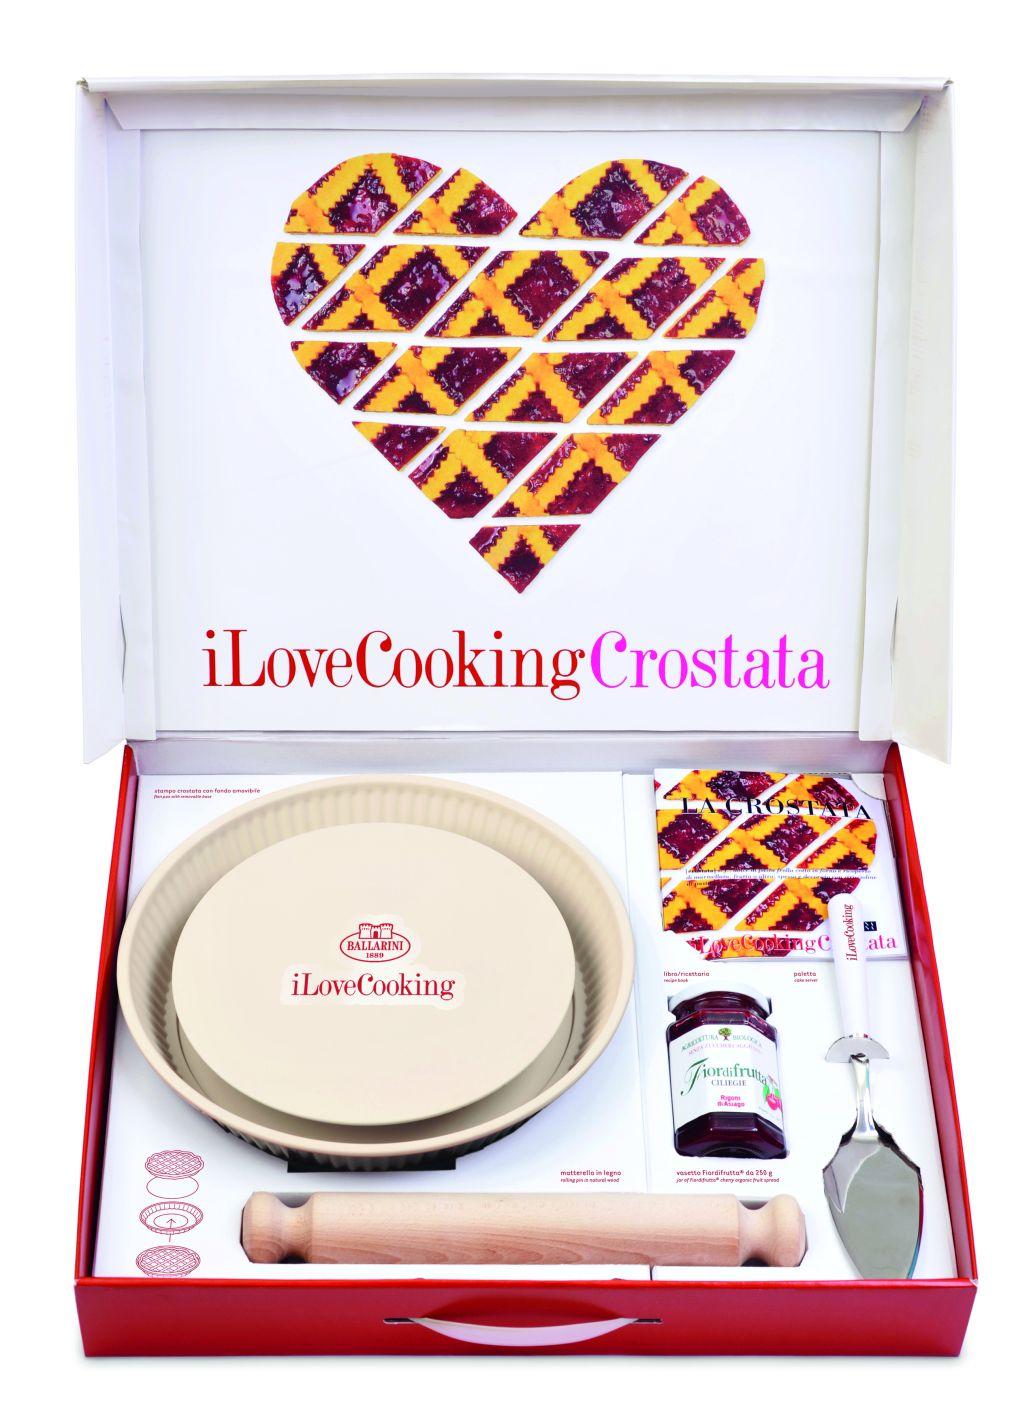 iLC Crostata pack aperto.jpg